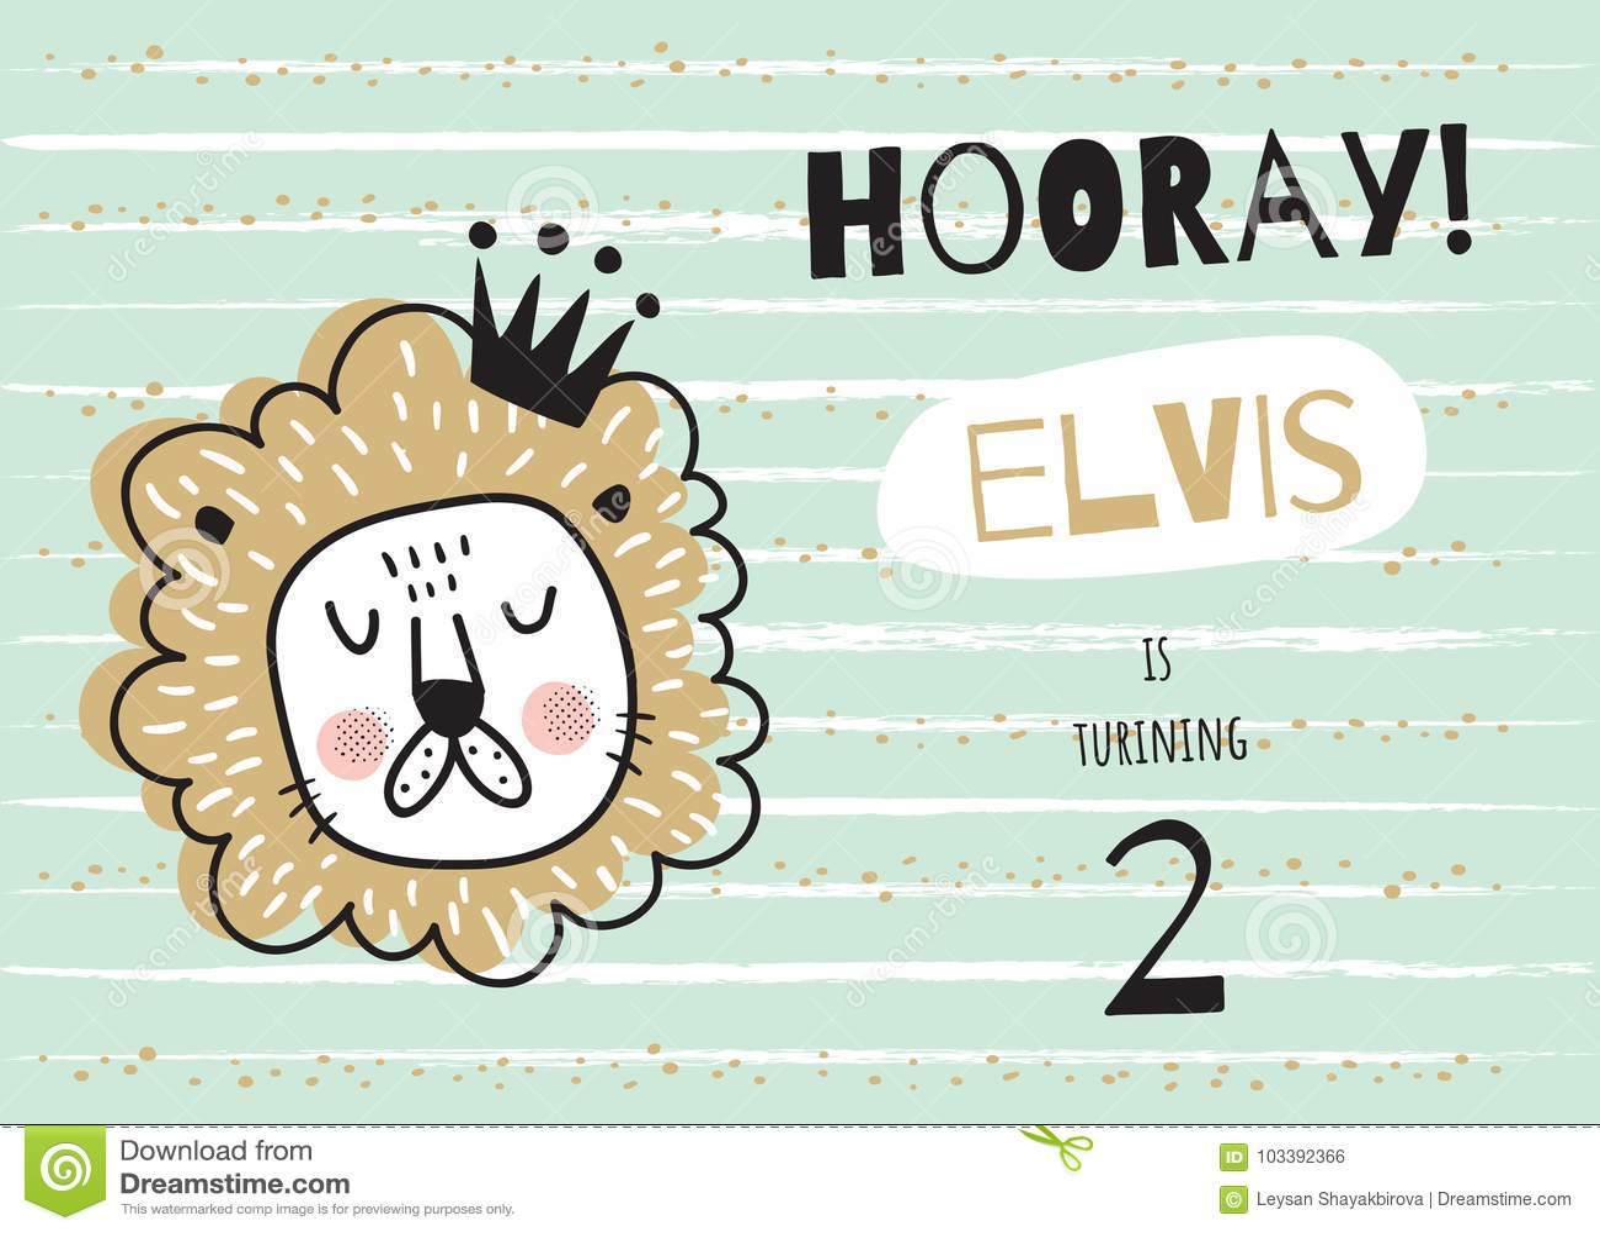 Elvis birthday party stock illustrations 2 elvis birthday party elvis birthday party stock illustrations 2 elvis birthday party stock illustrations vectors clipart dreamstime filmwisefo